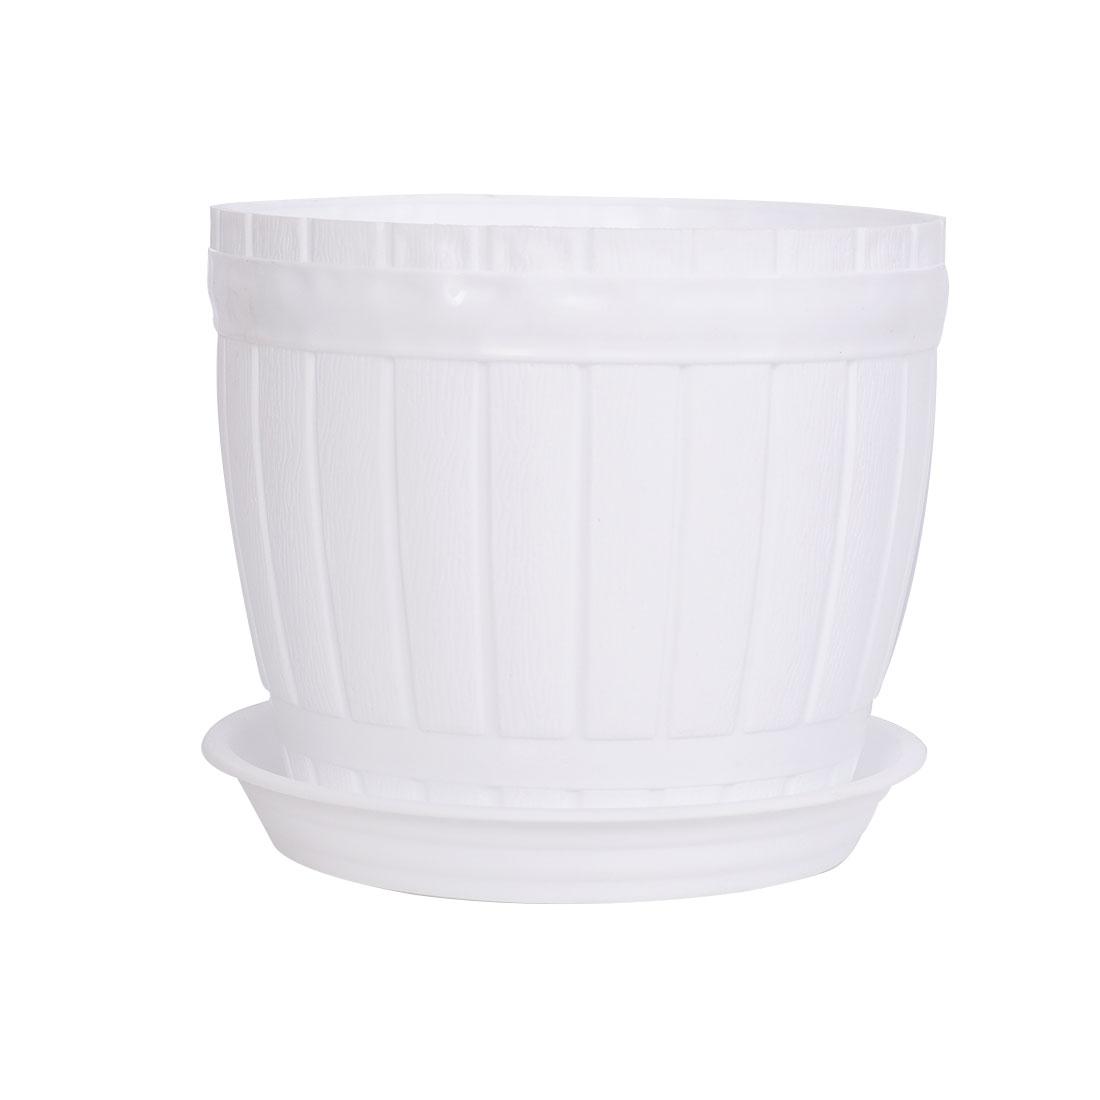 Home Windowsill Hotel Plastic Barrel Shape Plant Flower Pot Planter White w Tray